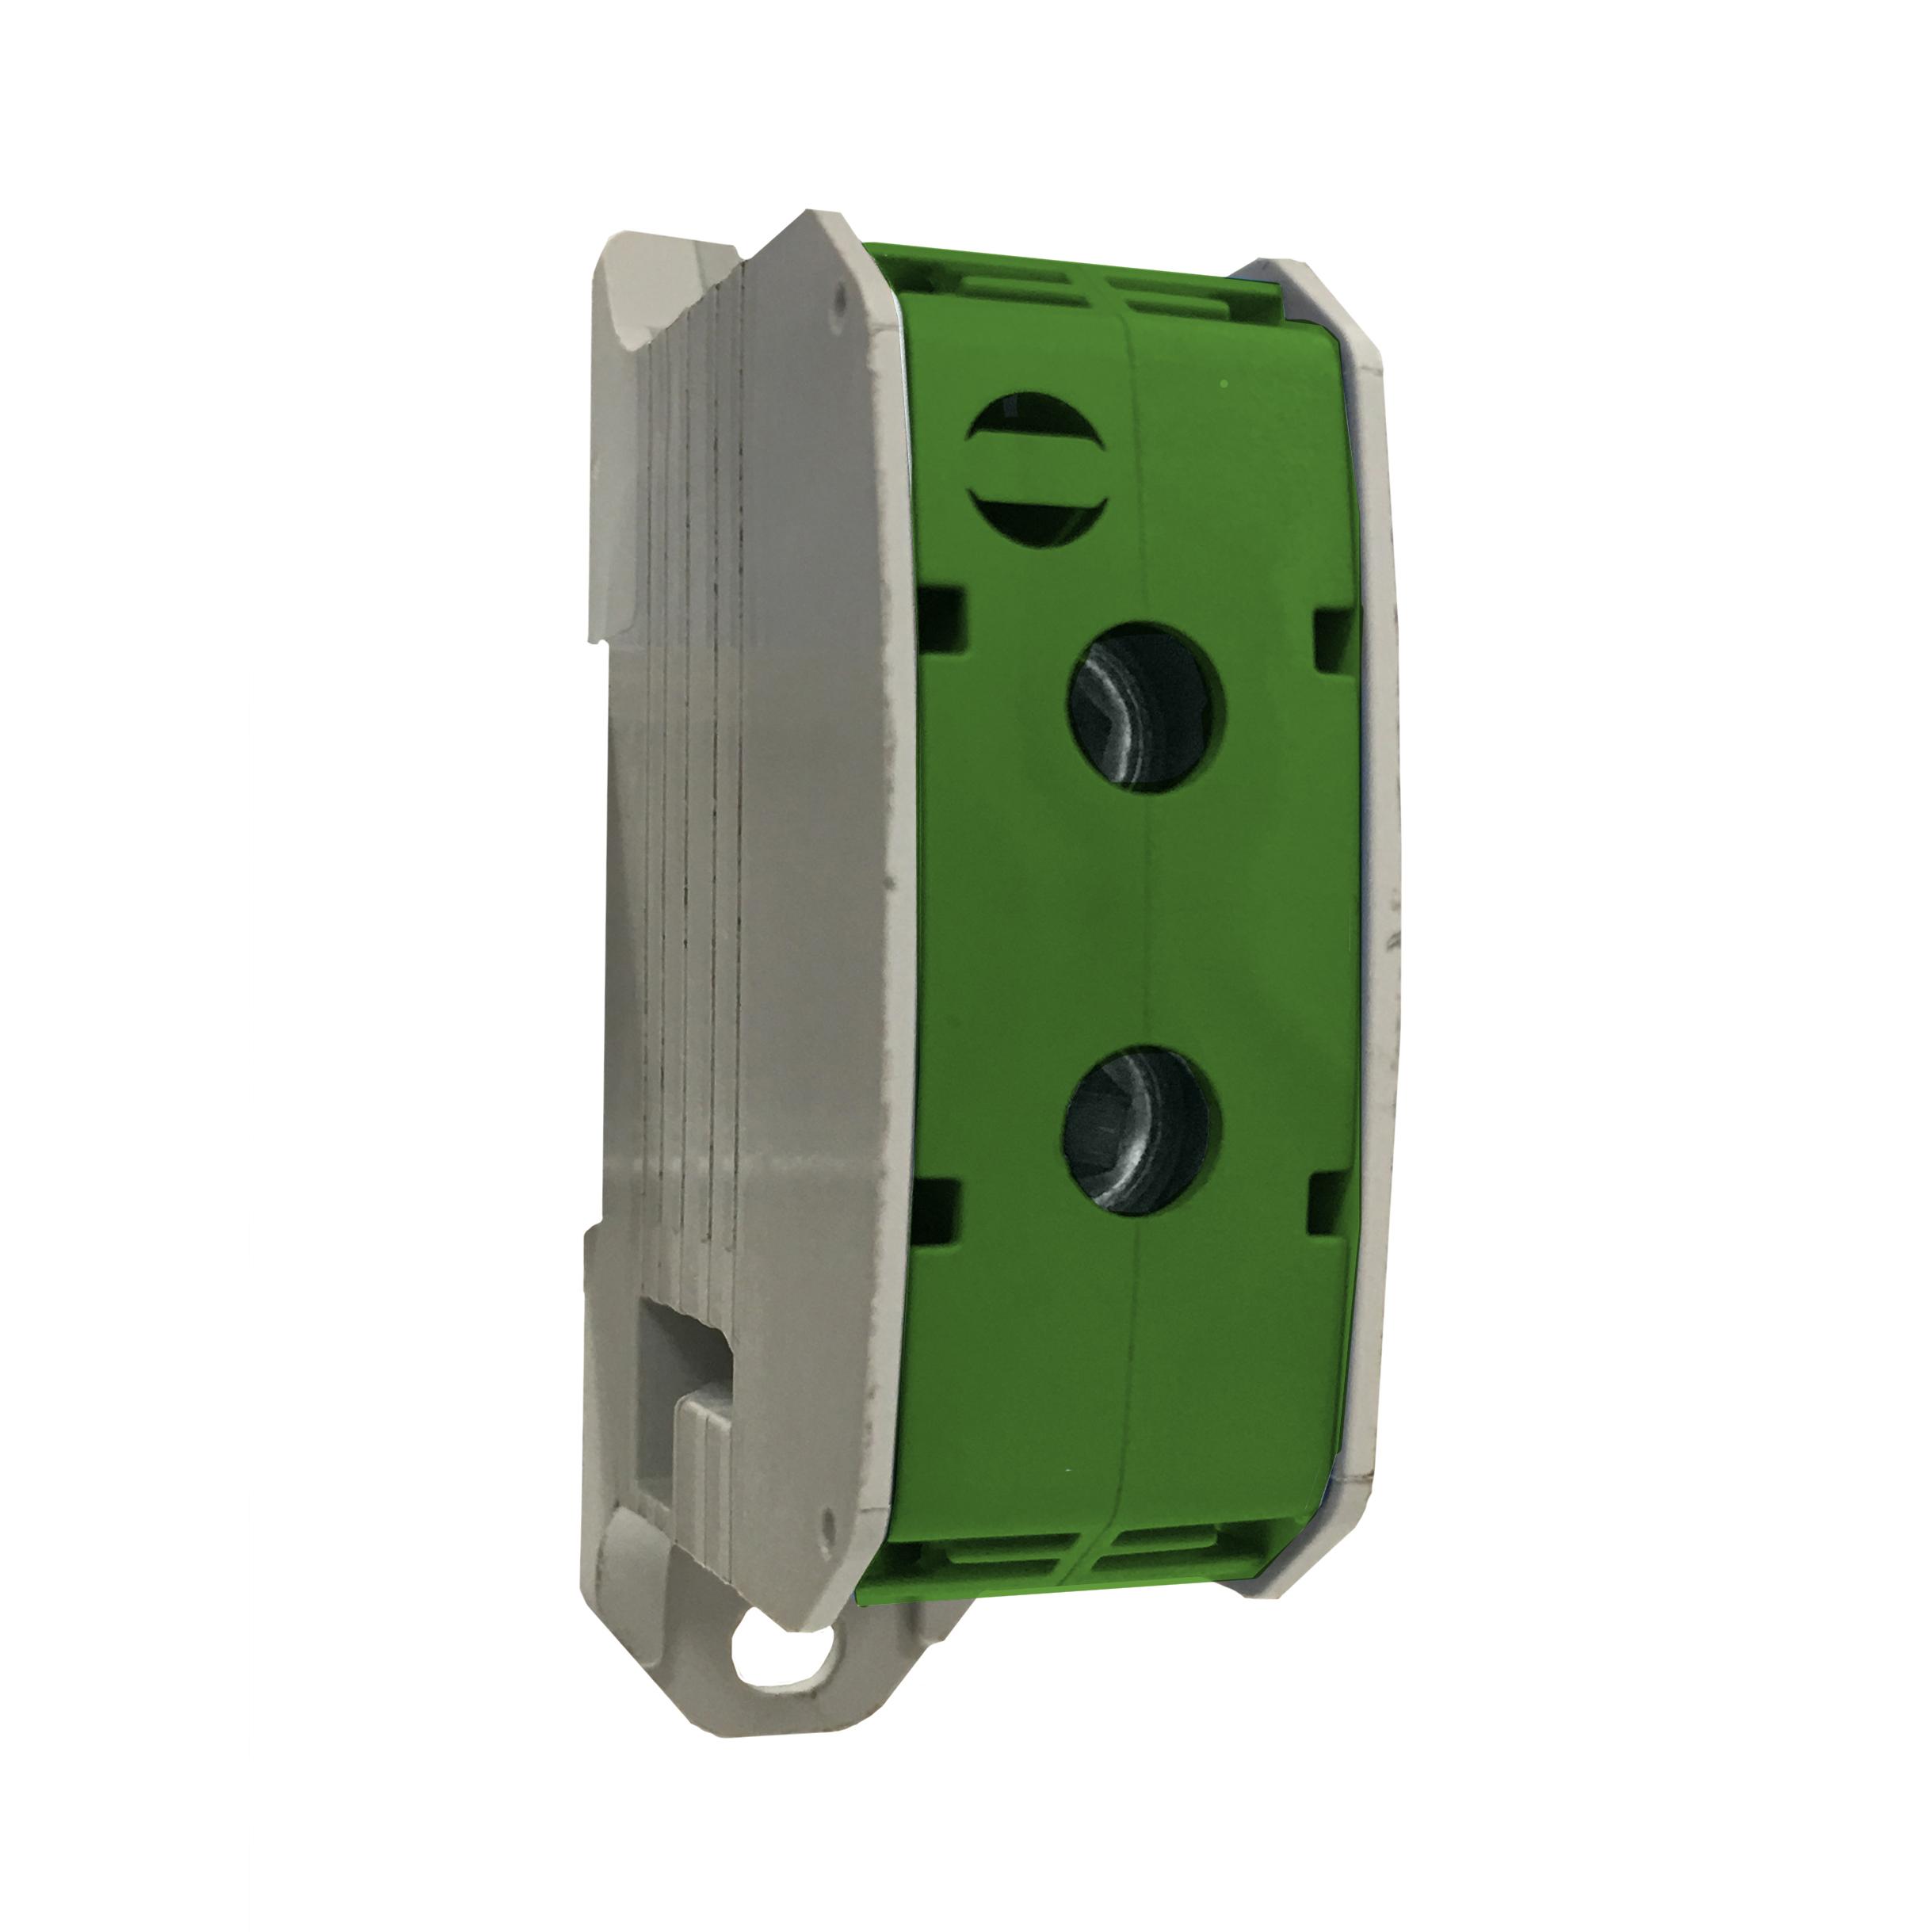 1 Stk Aluminium /Kupfer Klemme, 1-polig, 300mm² grün IKA21730--